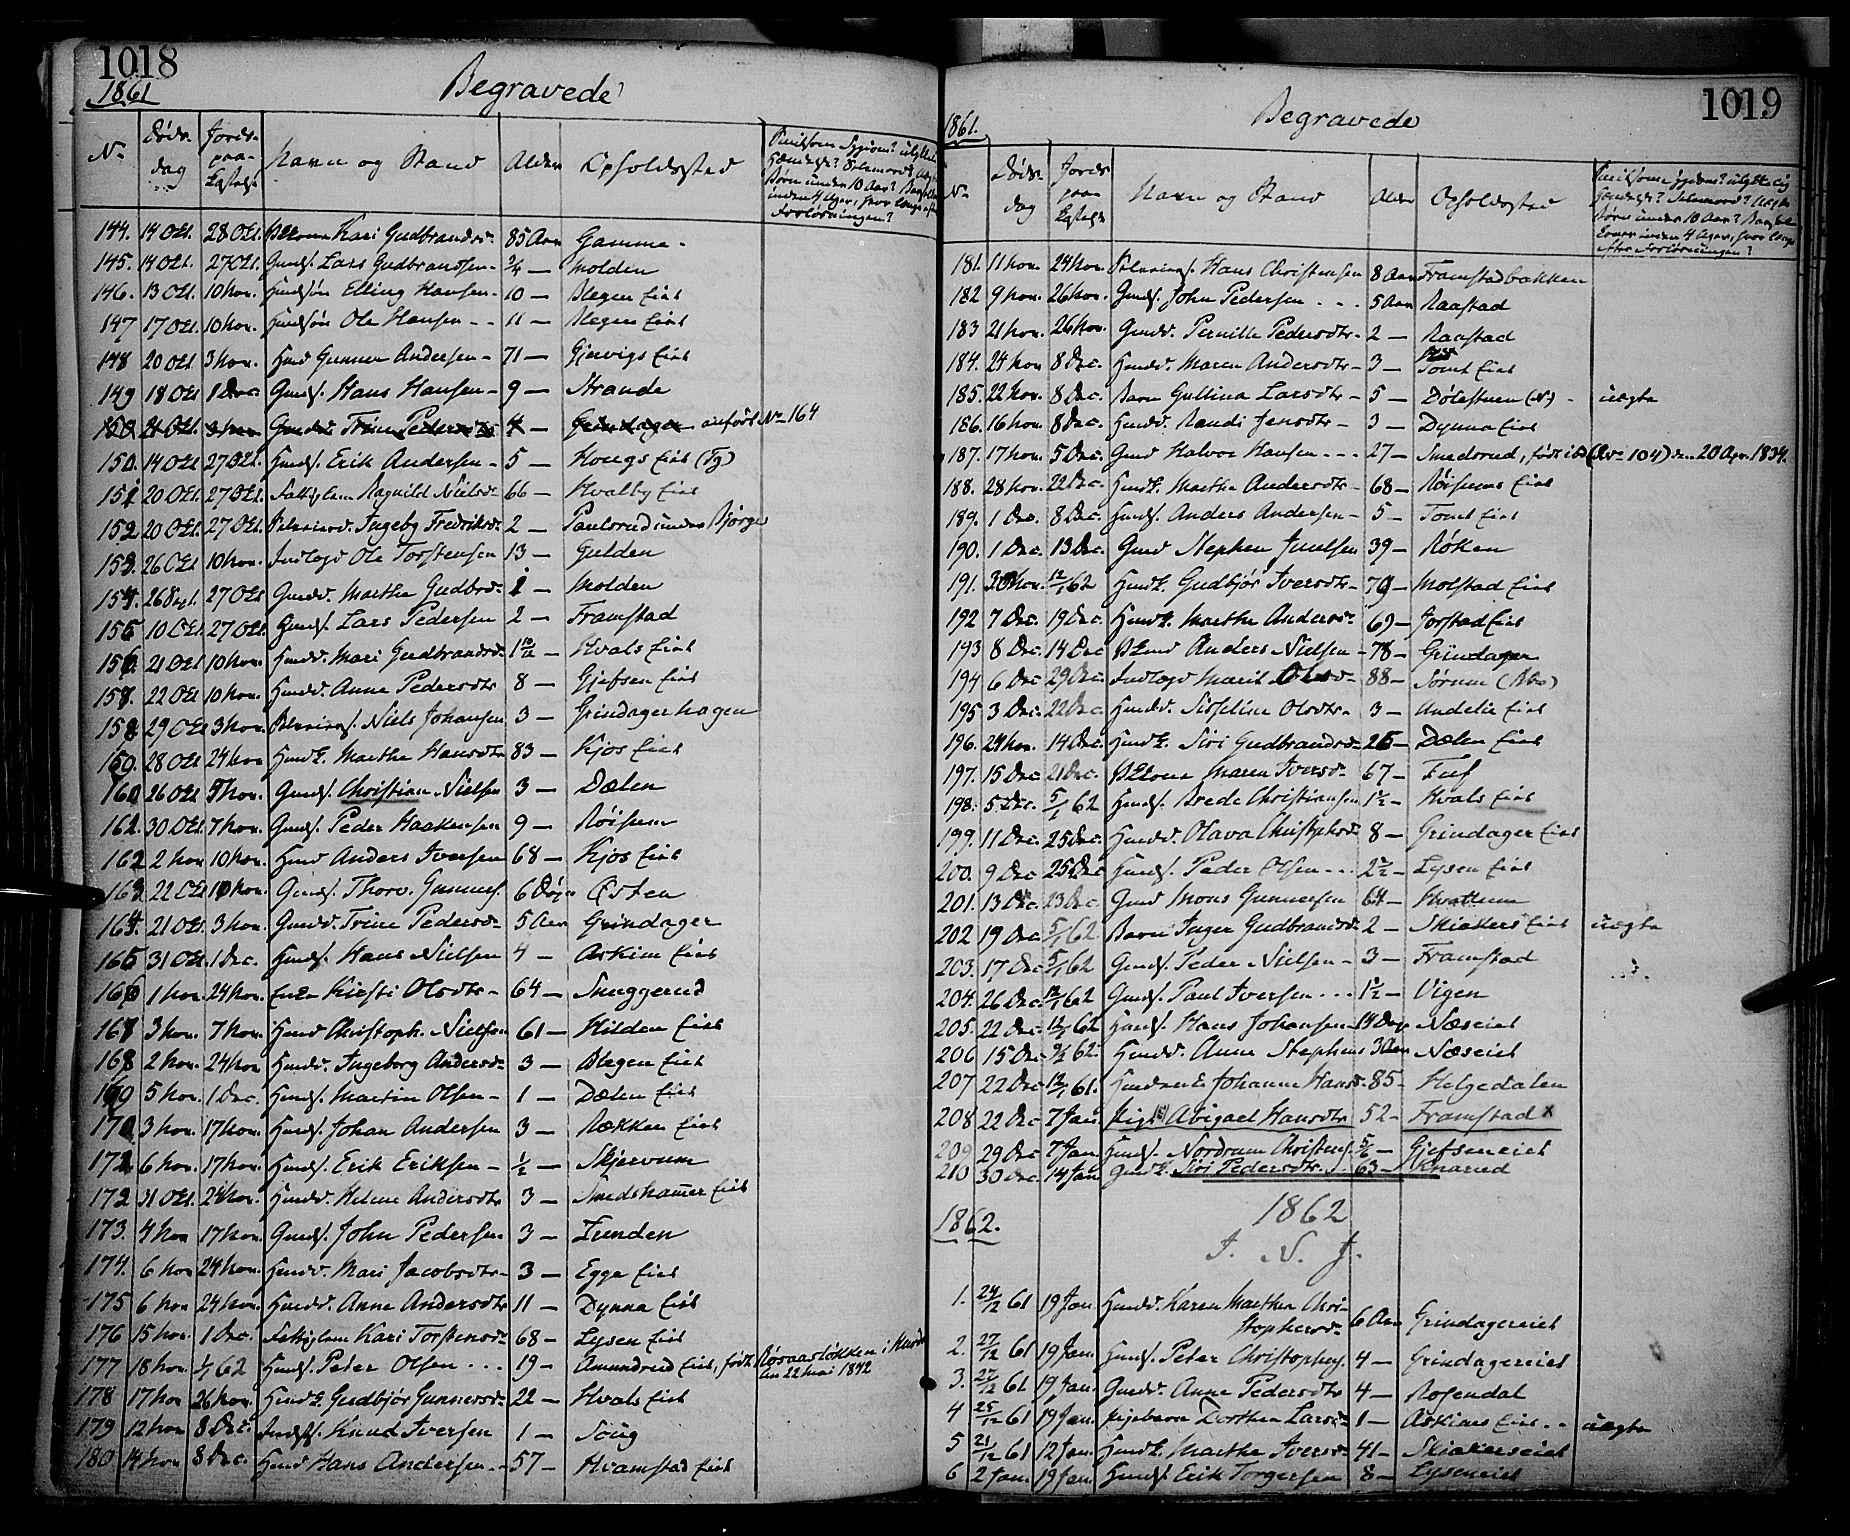 SAH, Gran prestekontor, Ministerialbok nr. 12, 1856-1874, s. 1018-1019